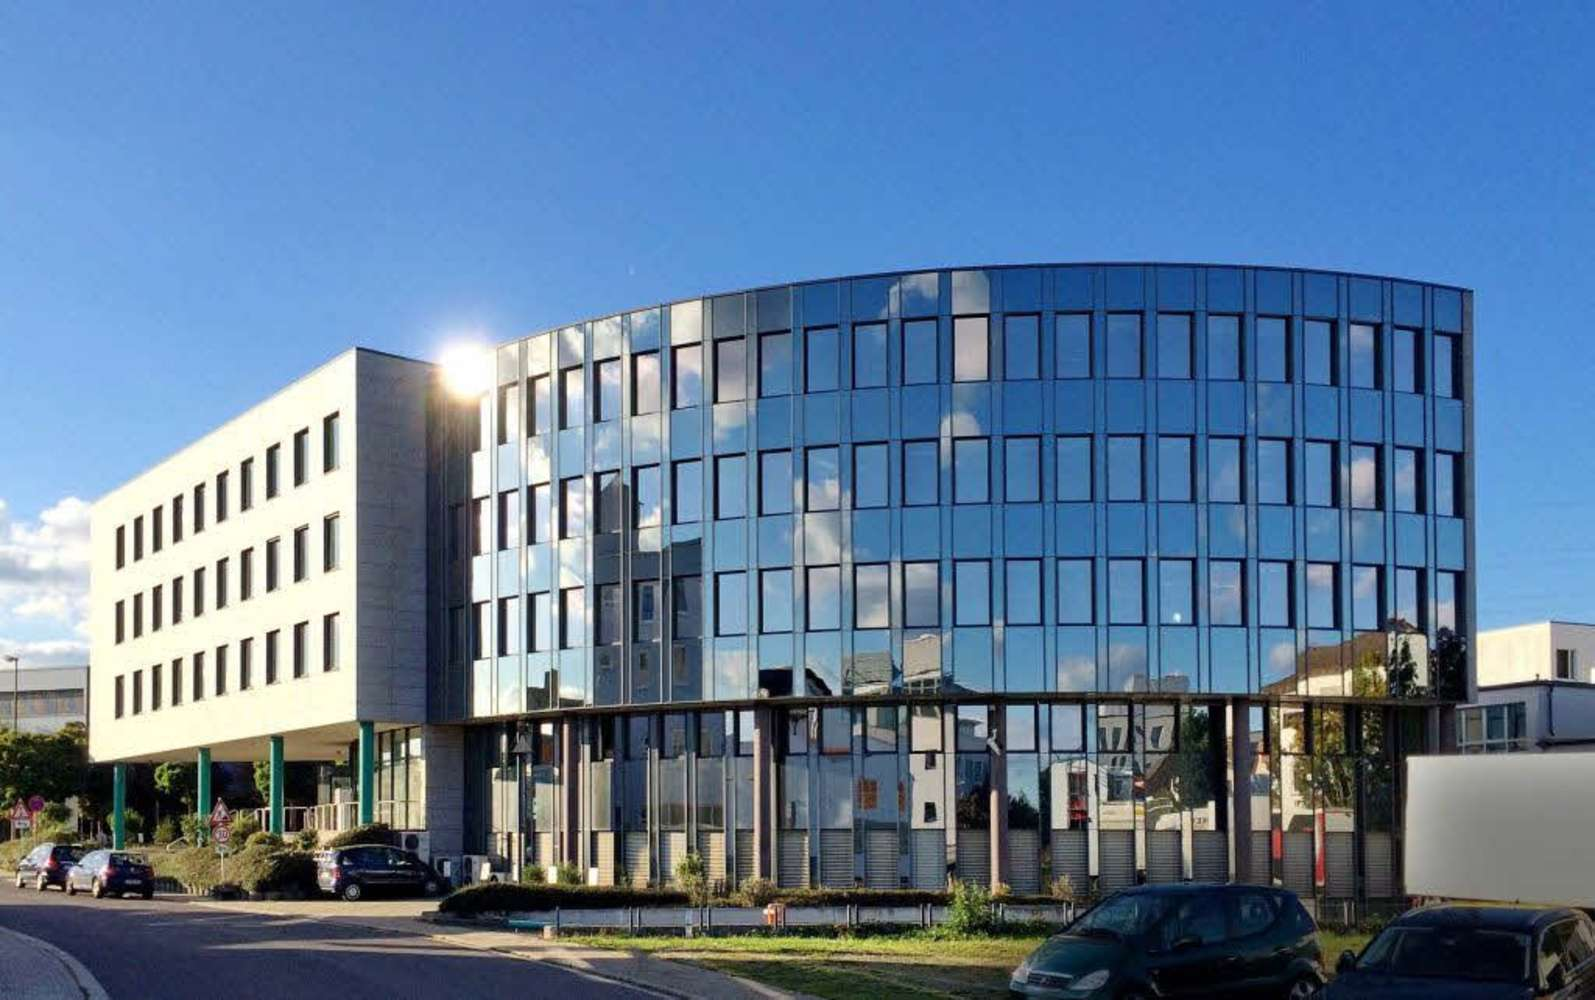 Büros Oberursel (taunus), 61440 - Büro - Oberursel (Taunus), Stierstadt - F1529 - 9419209